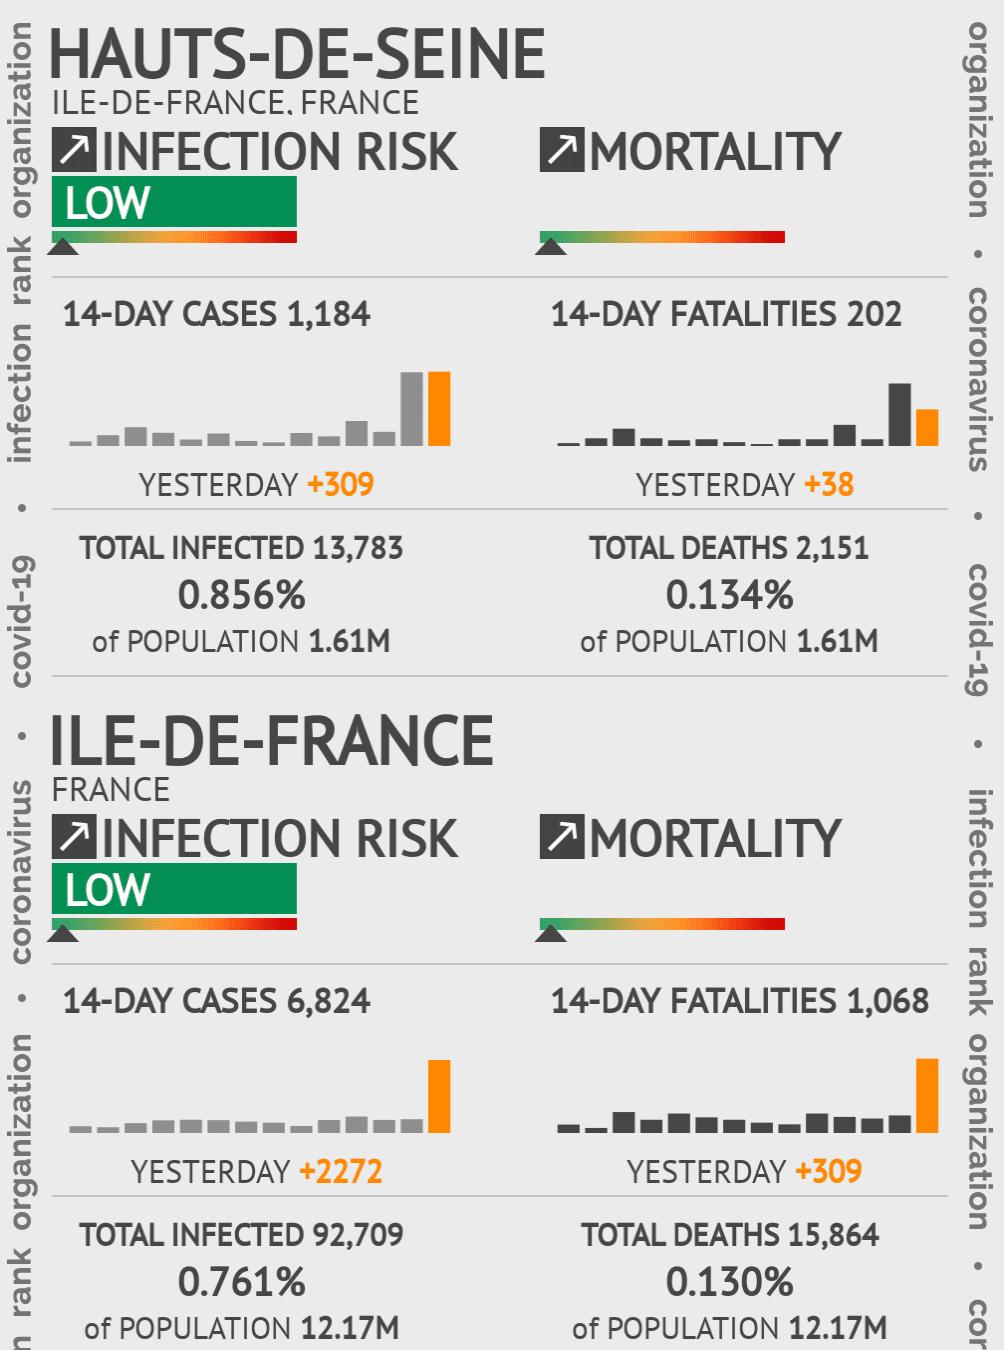 Hauts-de-Seine Coronavirus Covid-19 Risk of Infection on February 25, 2021